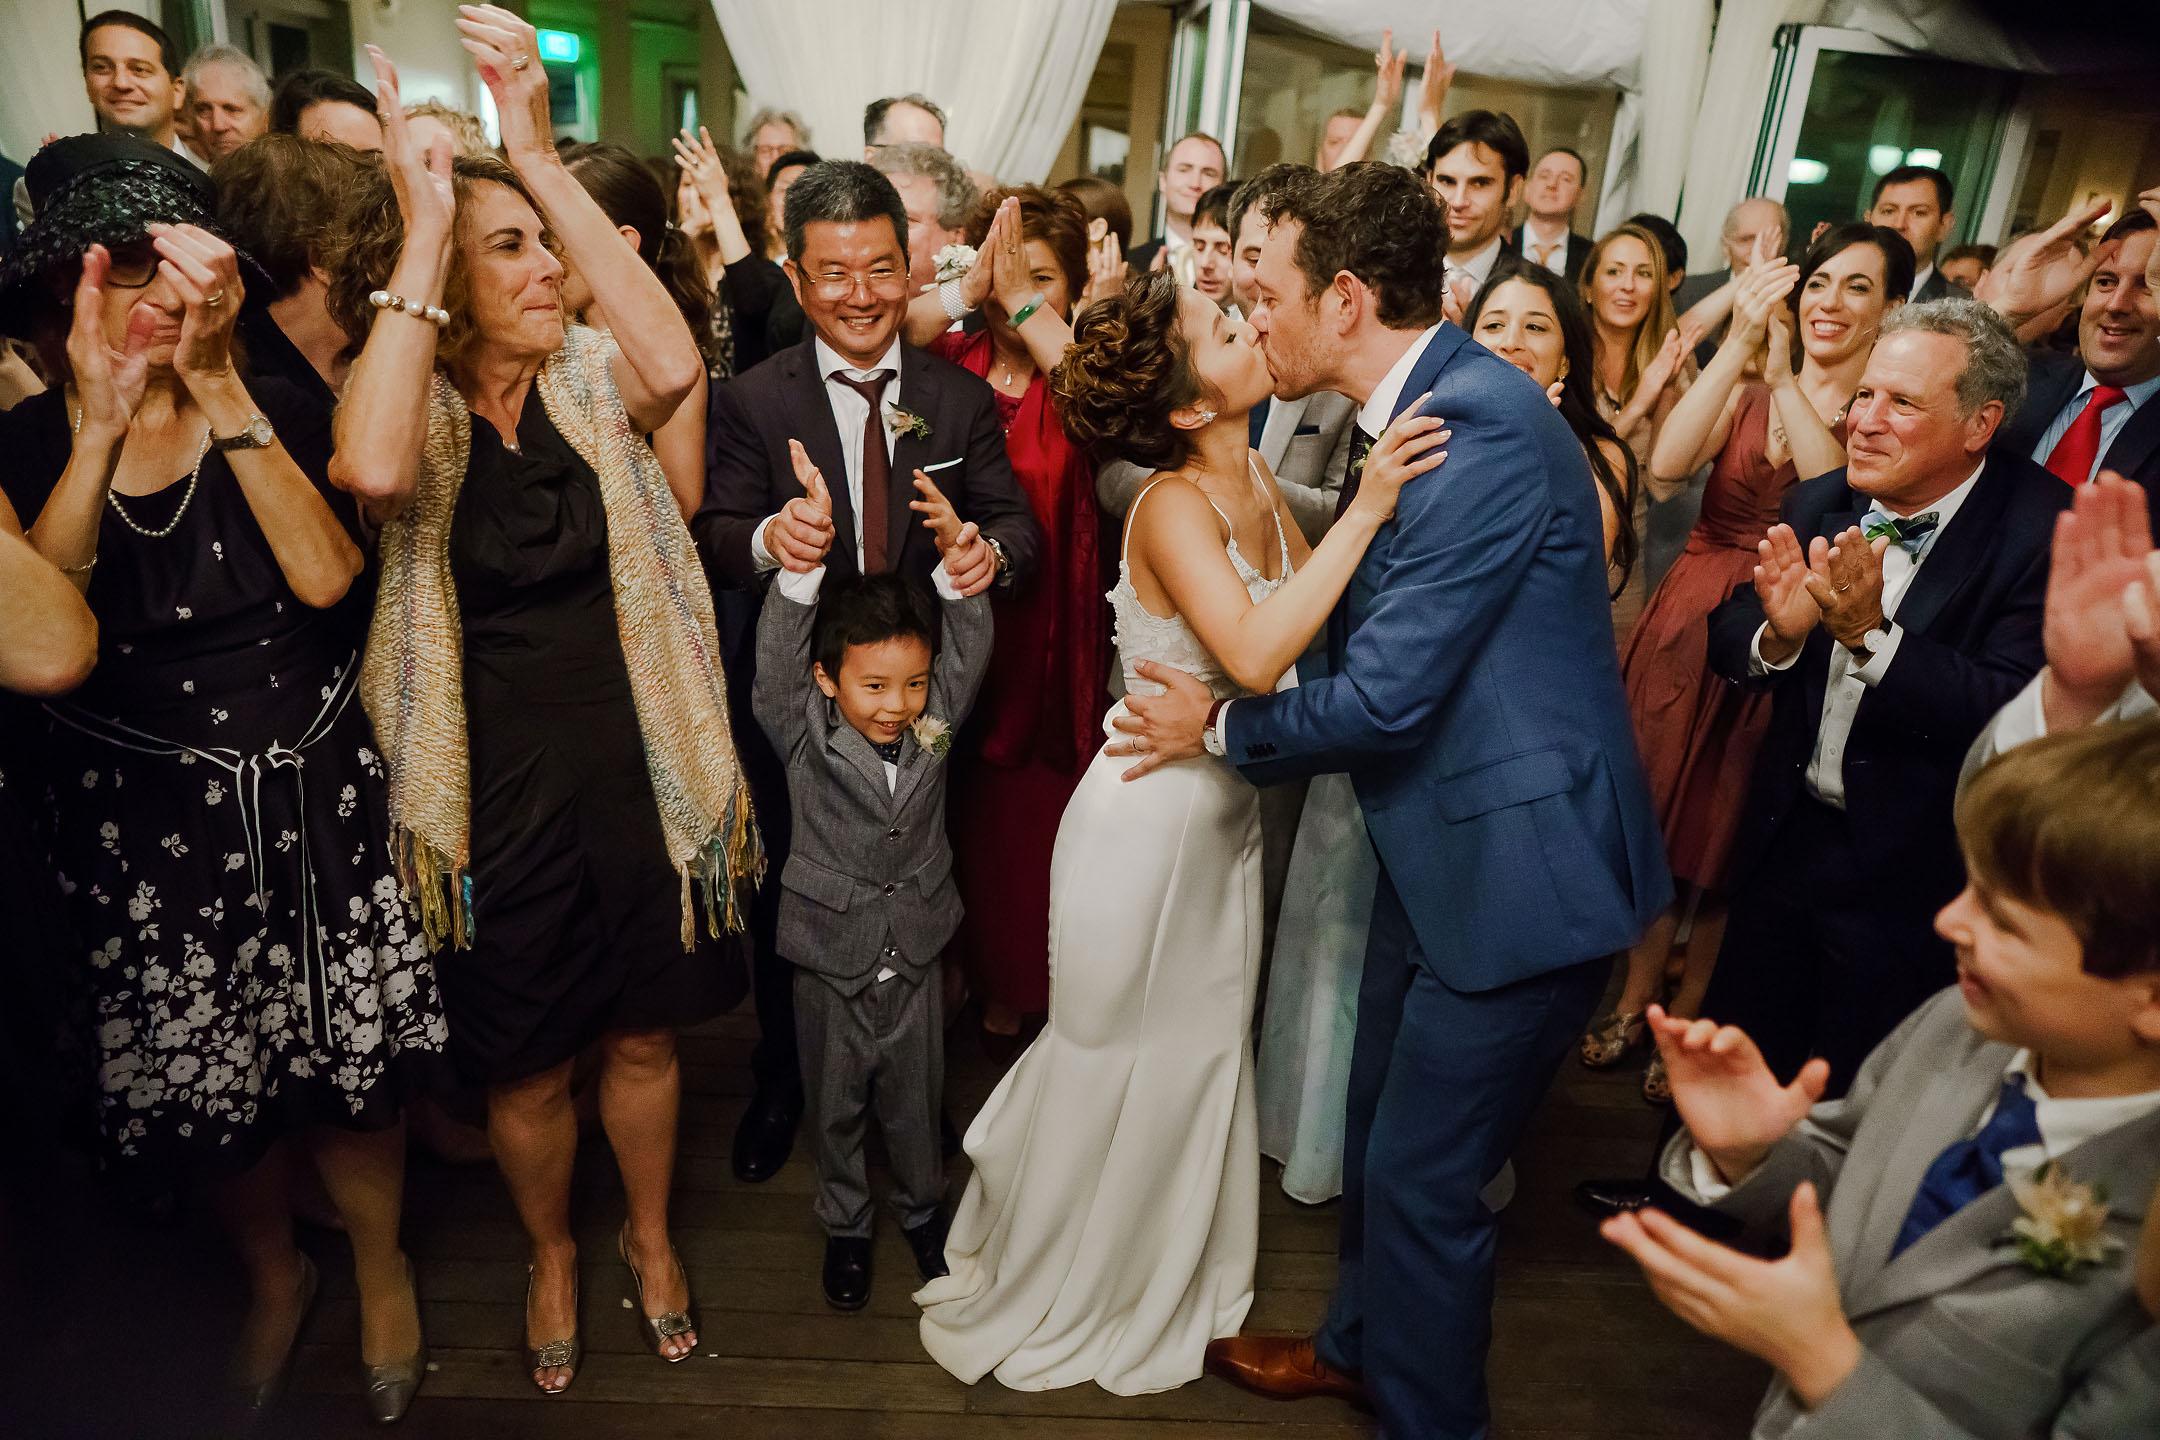 Chatham_Bars_Inn_wedding_42.jpg